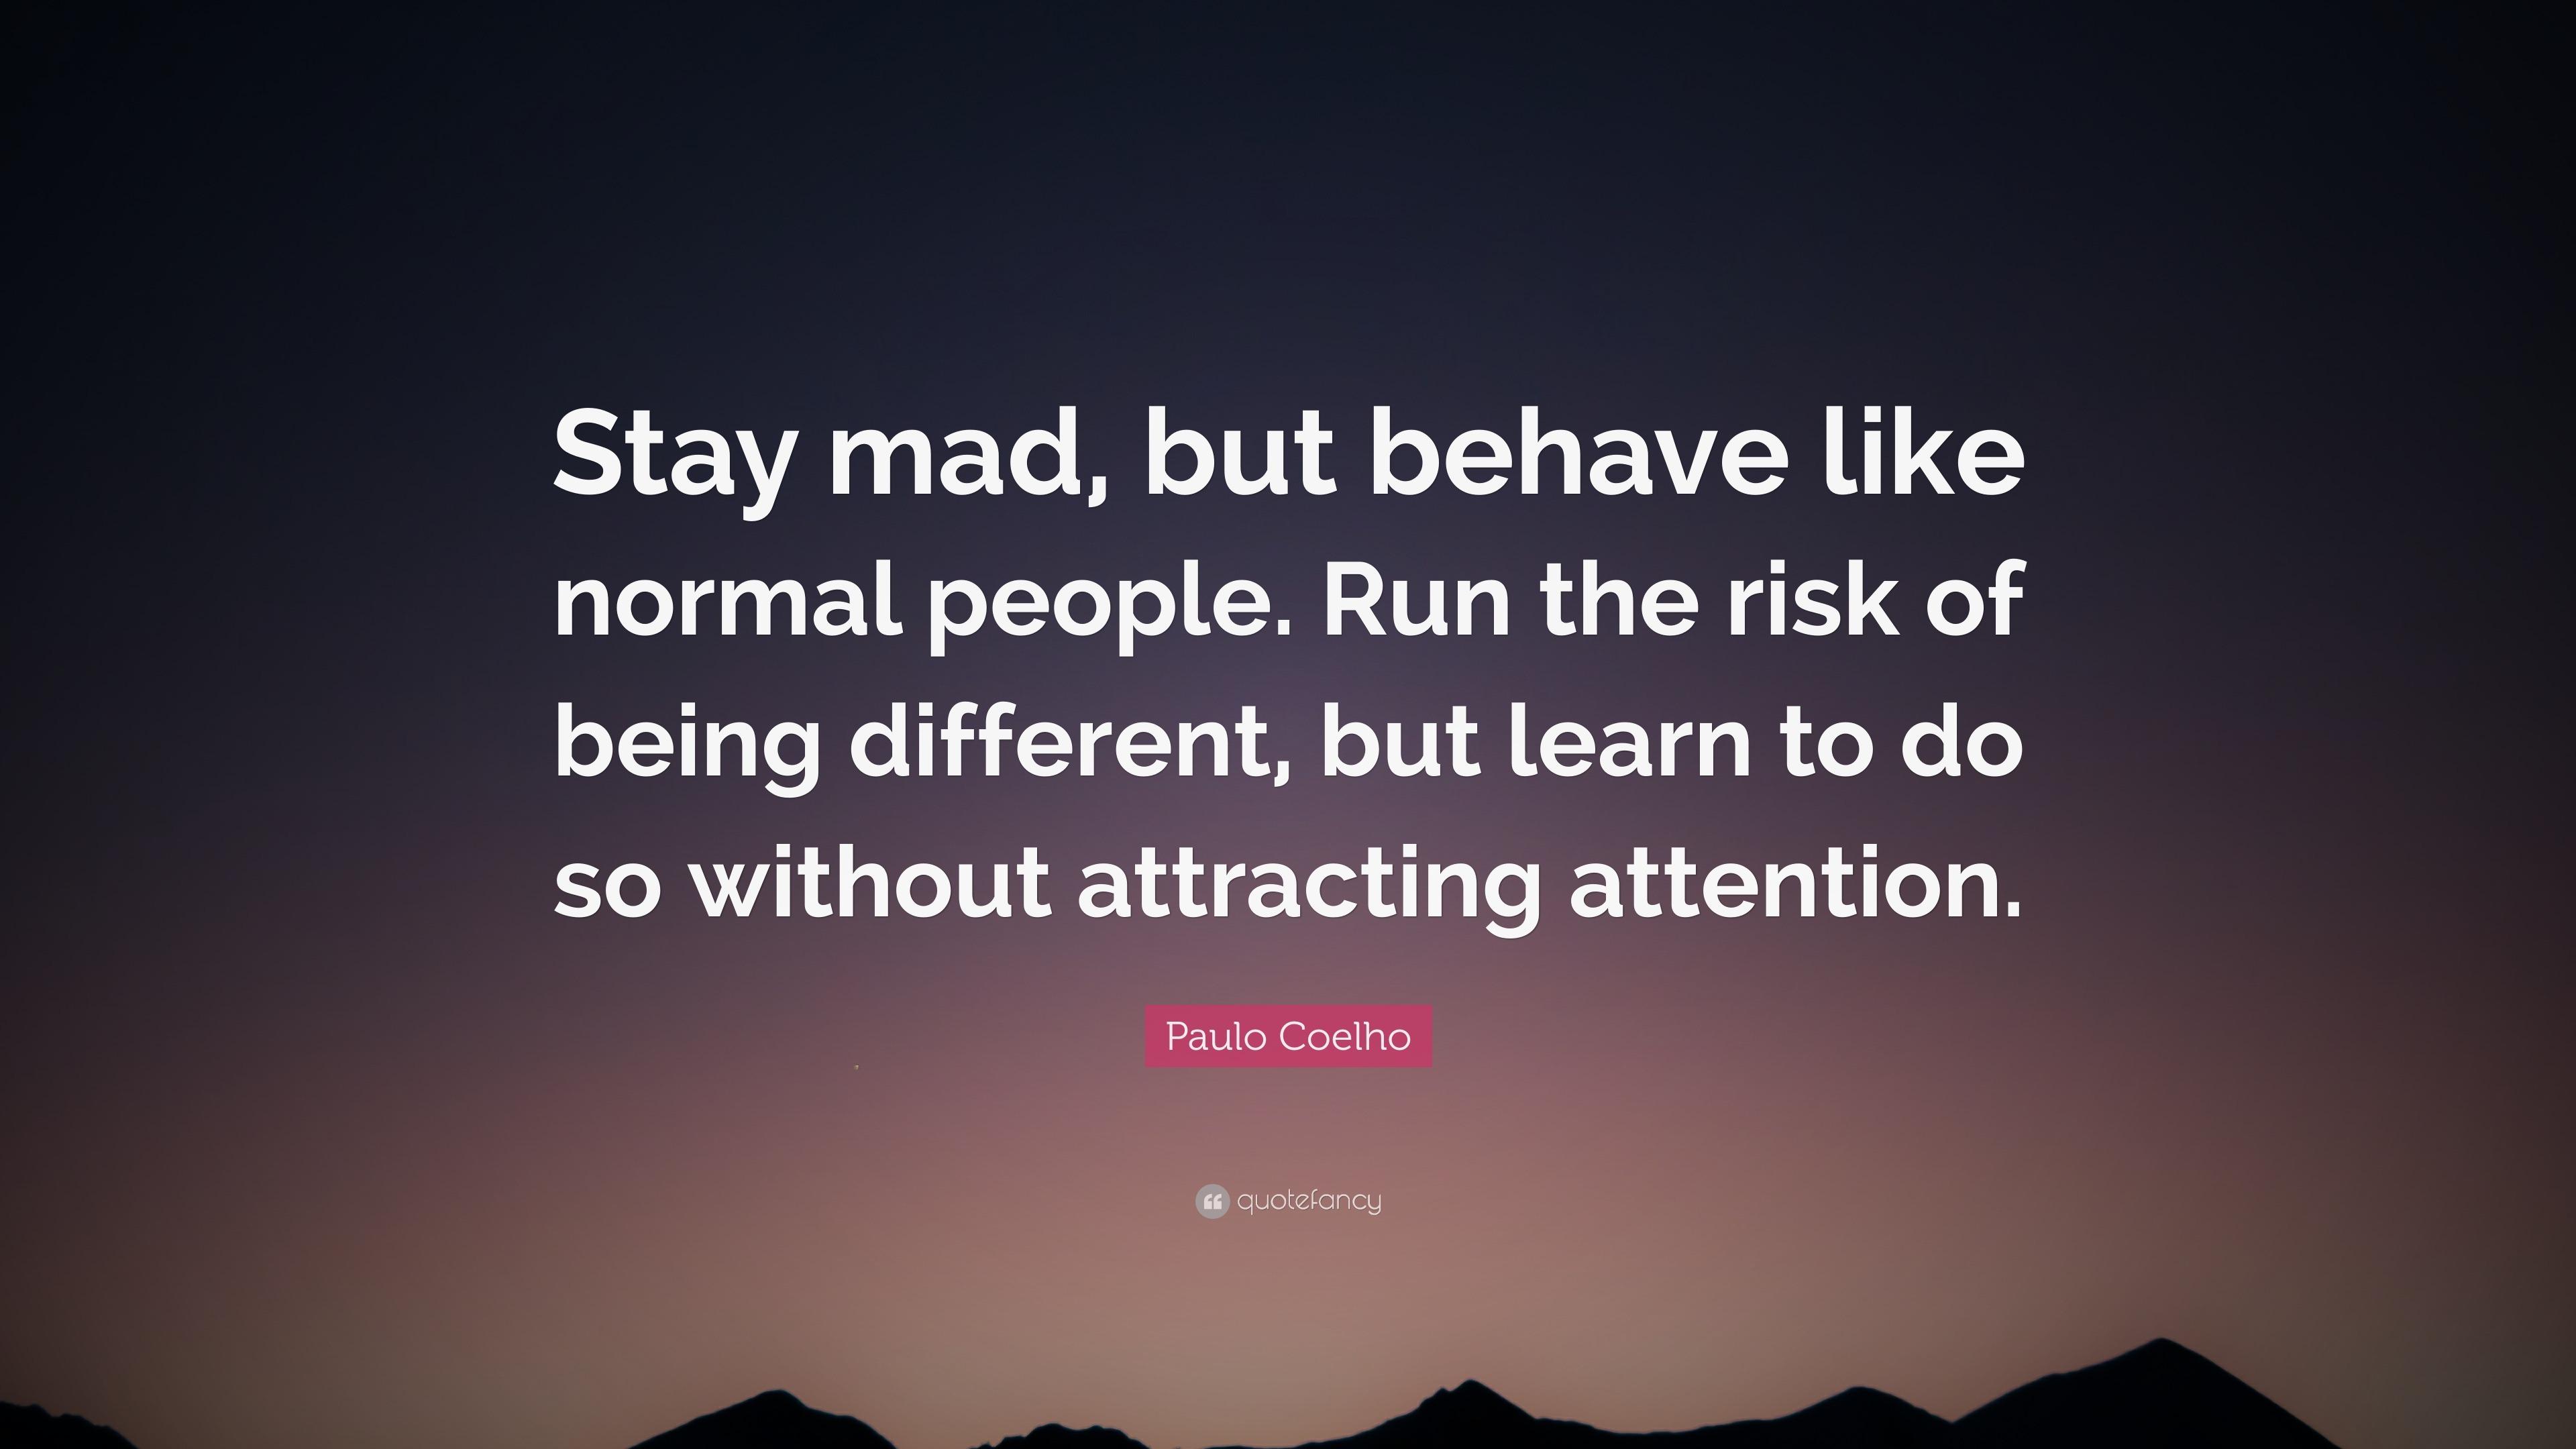 Paulo Coelho Quotes 100 wallpapers  Quotefancy